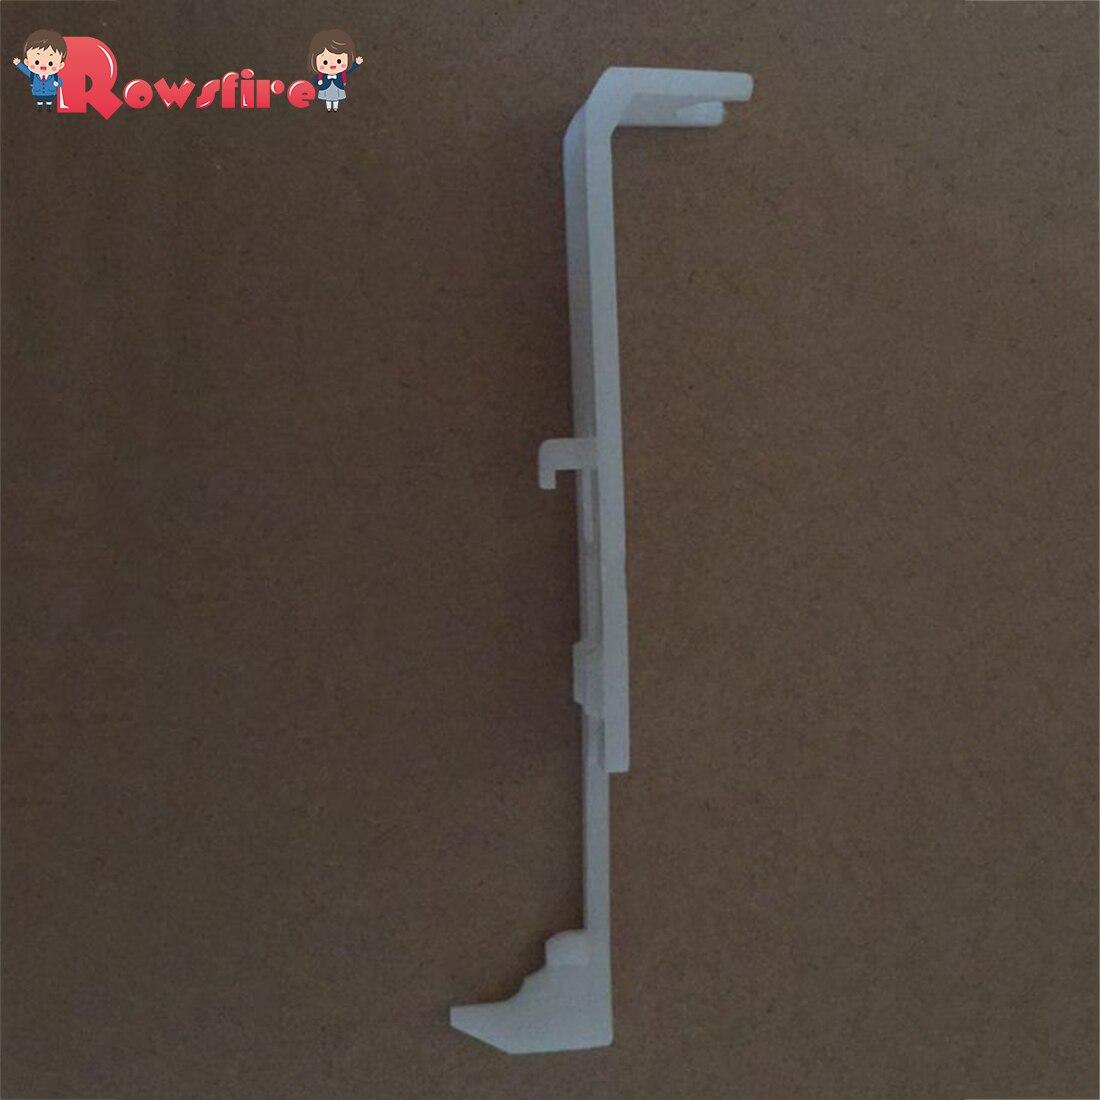 Rowsfire 1 Pcs Nylon Water Gel Beads Parts Original Enhanced Tappet For XWE M4 Water Gel Blaster Hot Sale